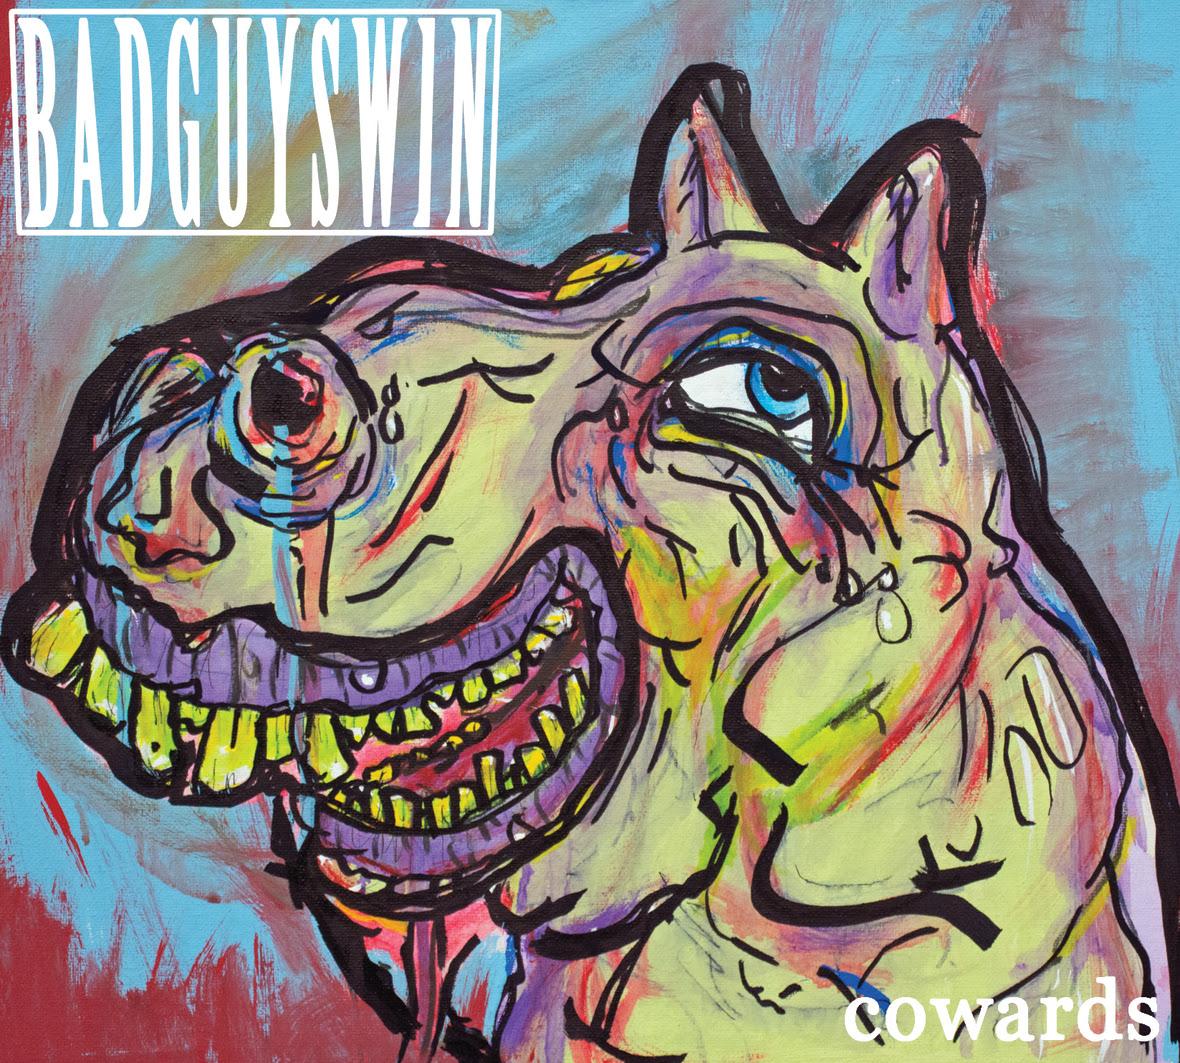 bgw-cowards-albumcover